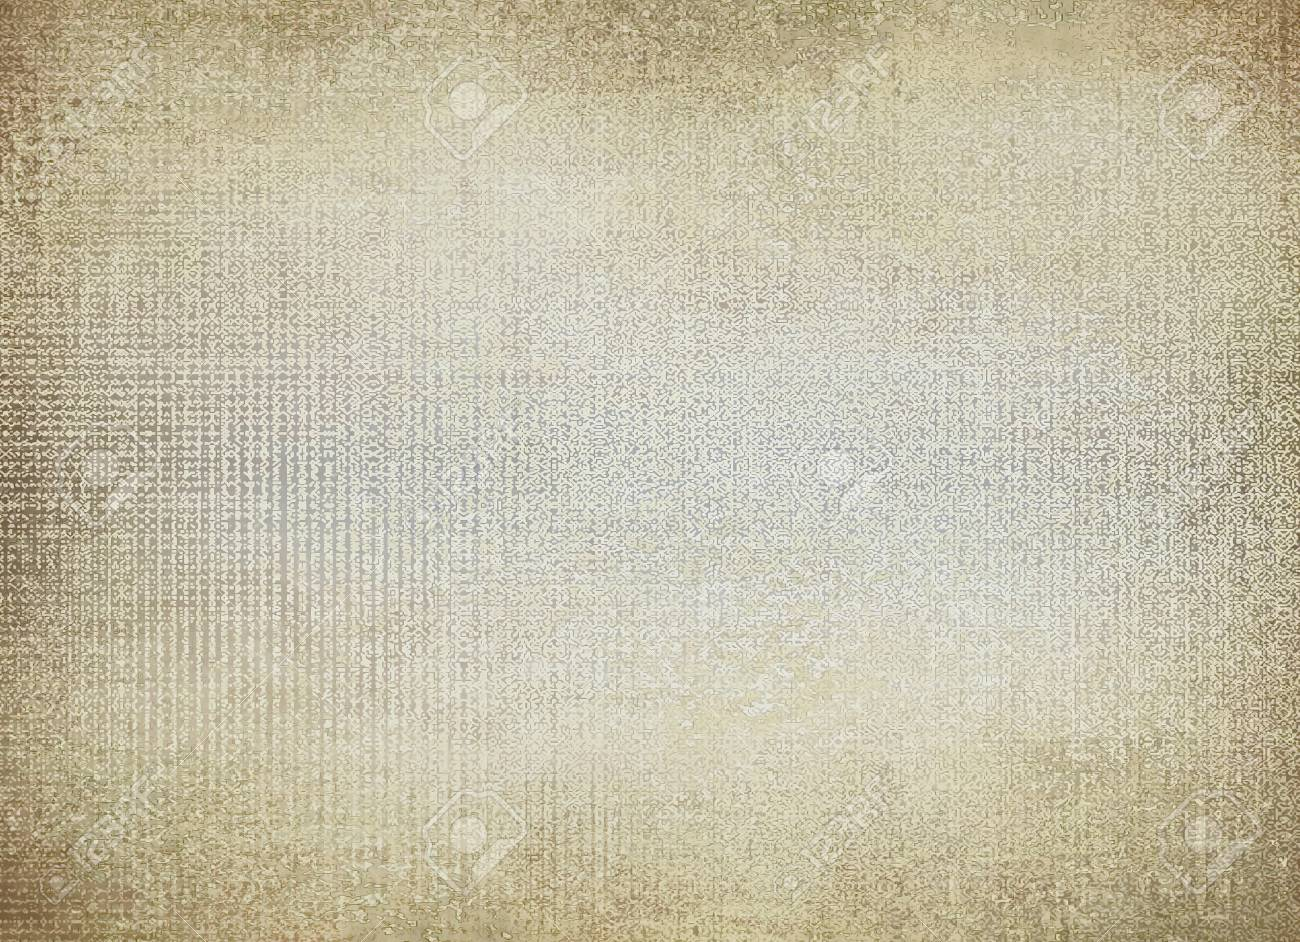 Vintage Background Texture Design Grunge Beautiful Aged Background